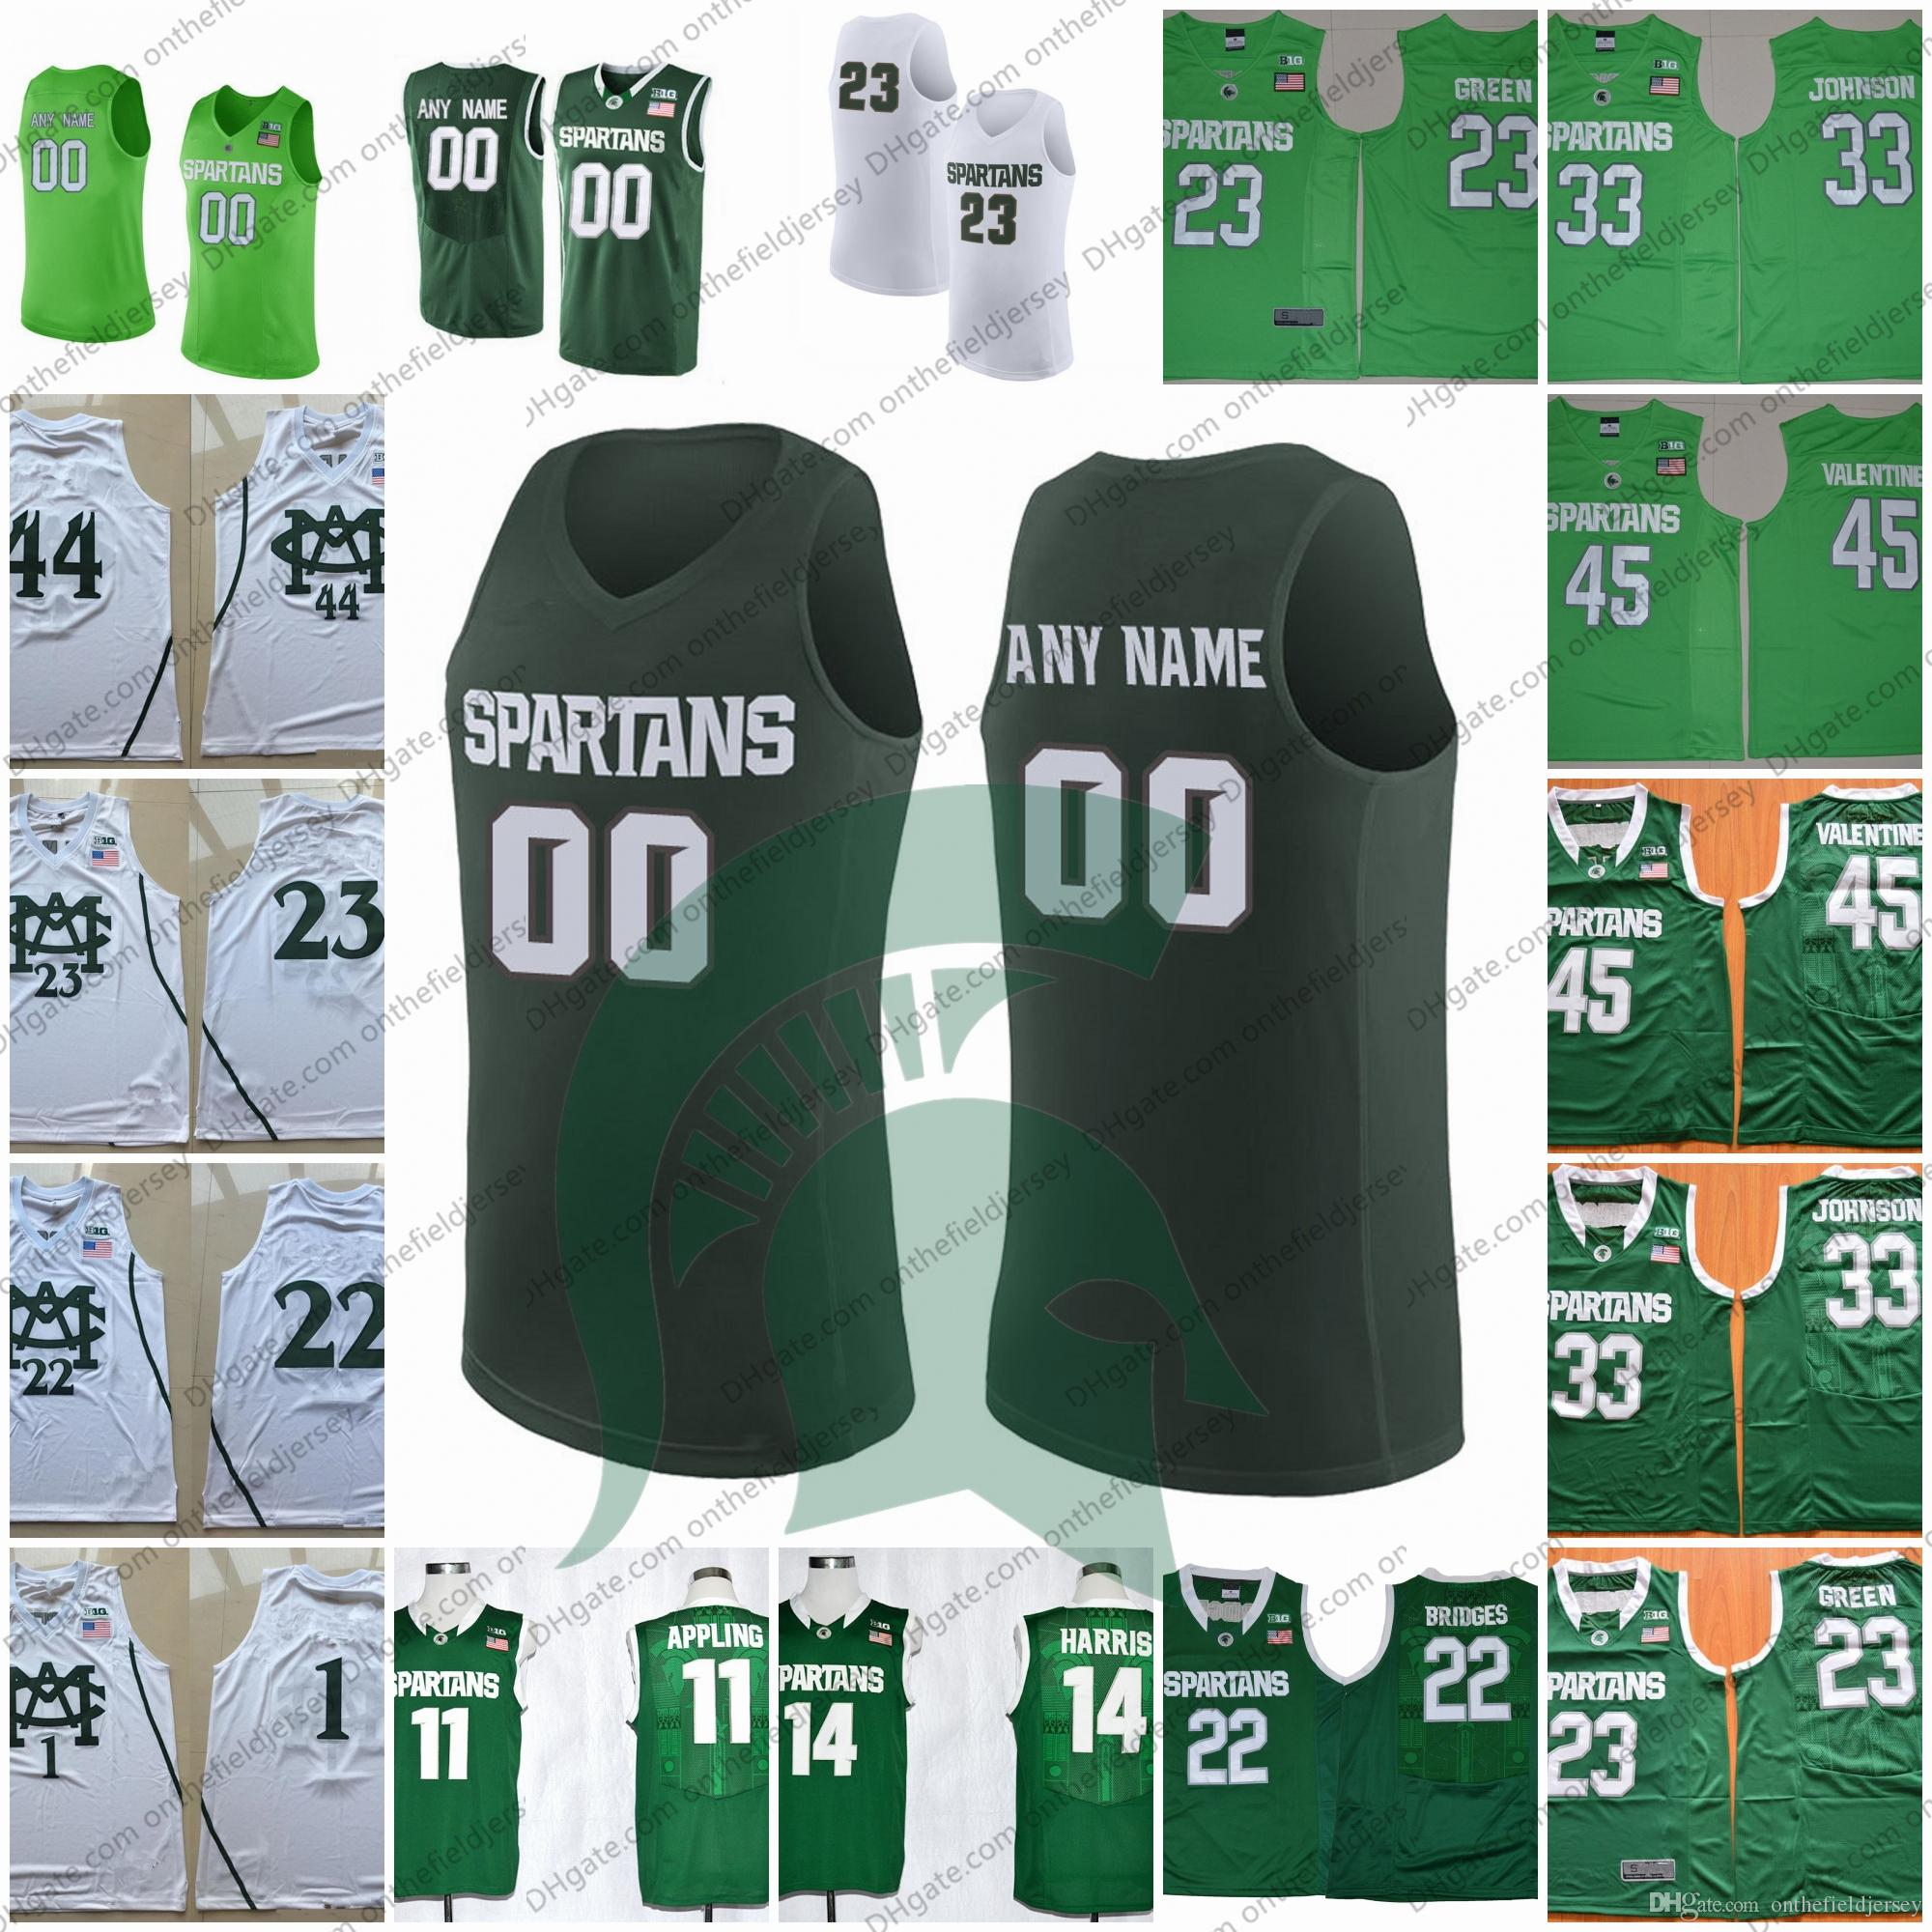 reputable site bf1bc 21e11 shopping draymond green michigan state jersey 1b02b 02f7d